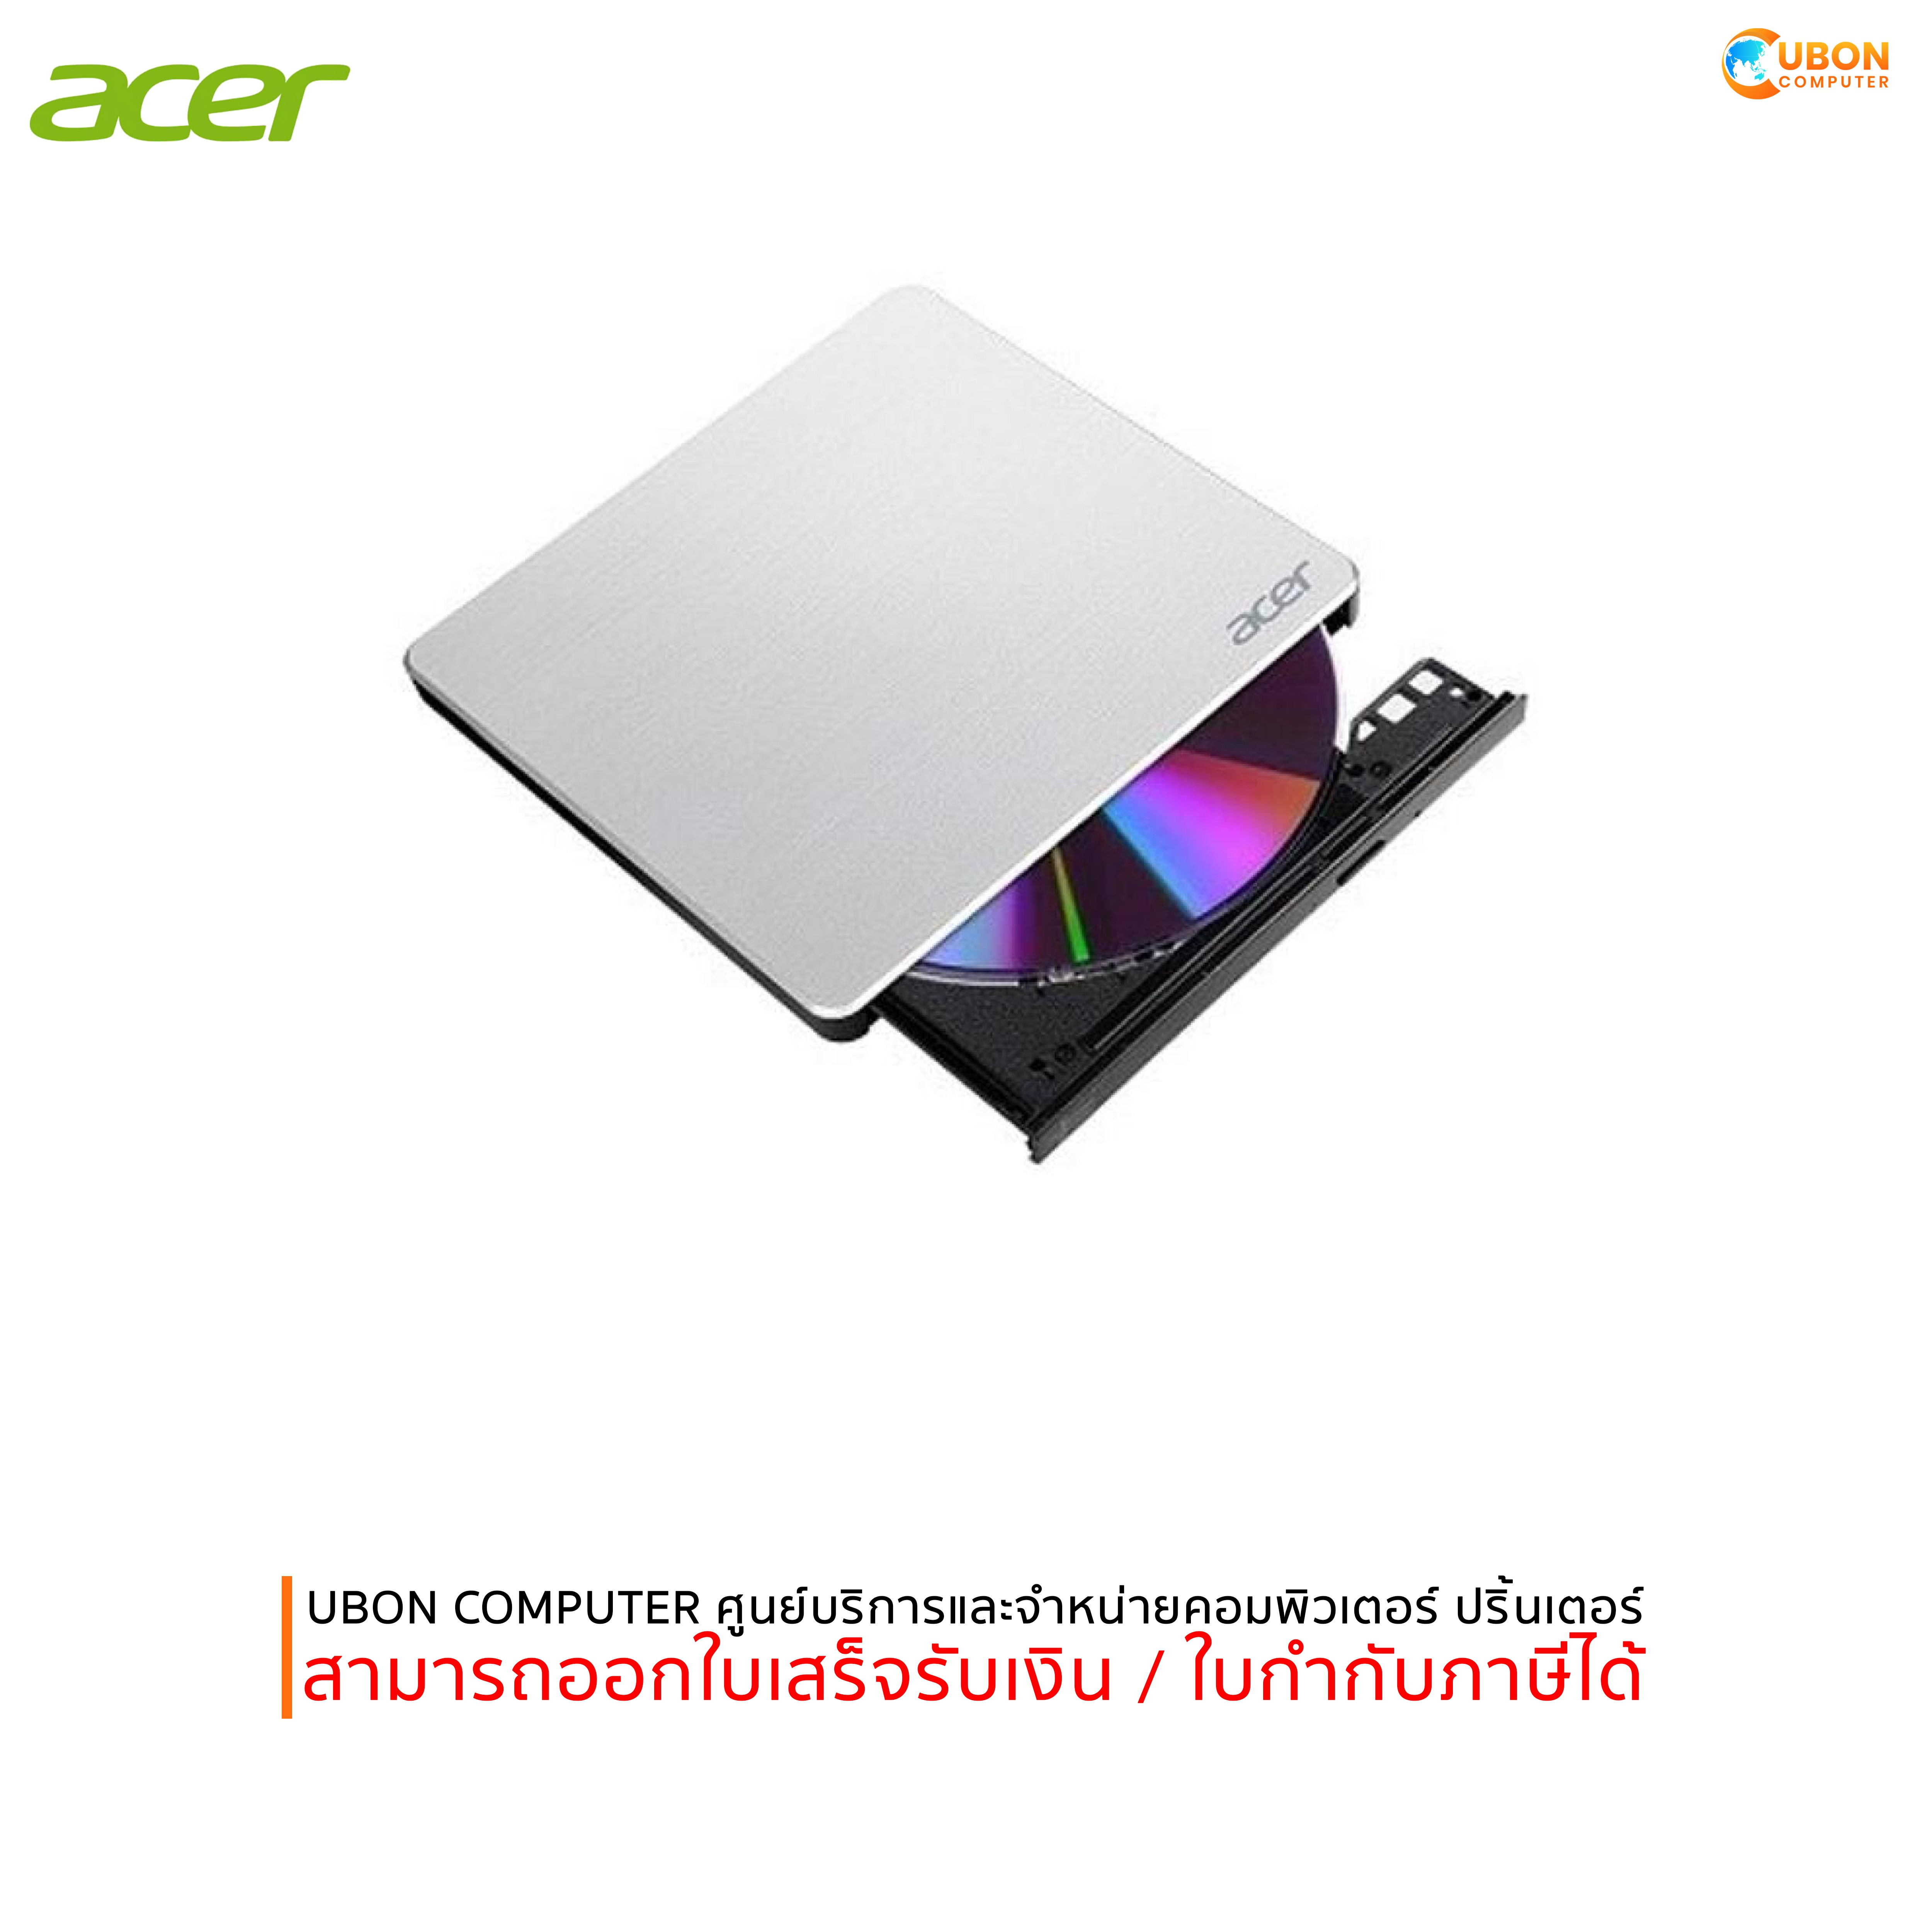 Acer External Optical Drive Usb 2.0 Dvd Writer Silver Slim Aod610 (by Uboncomputer).